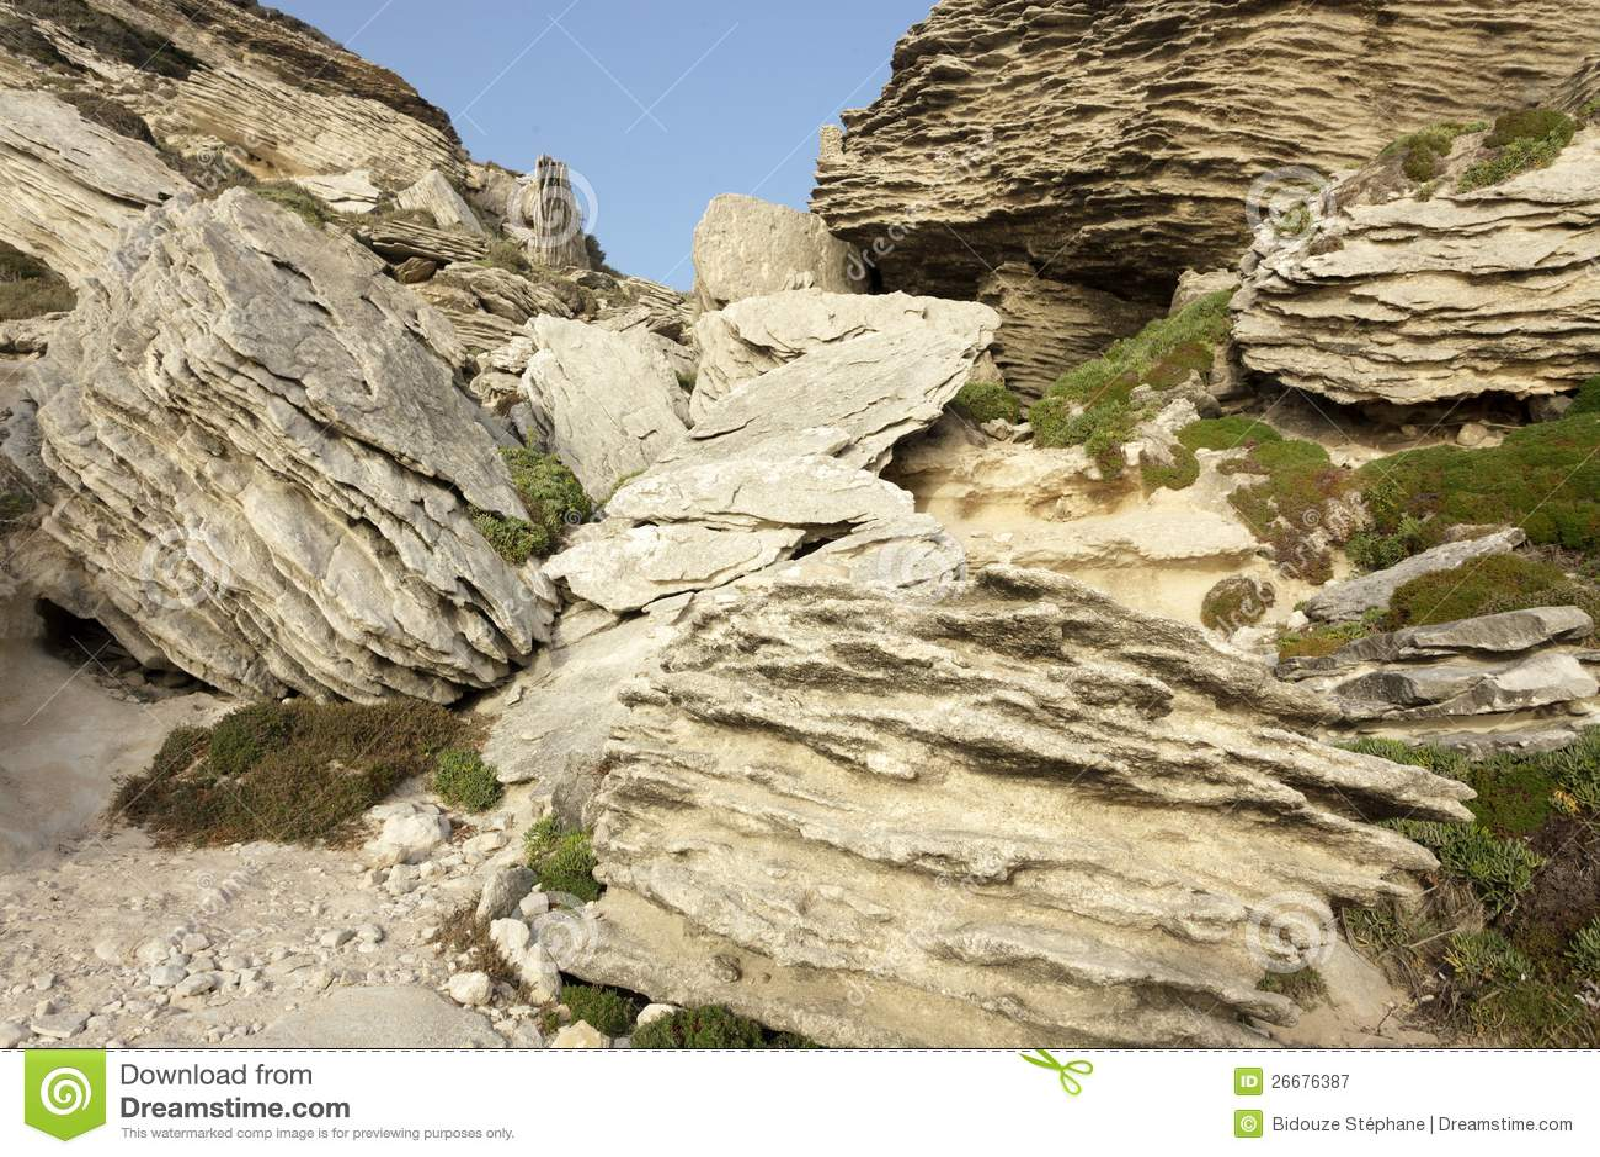 Limestone rocks royalty free stock photography image for Limestone landscape rock